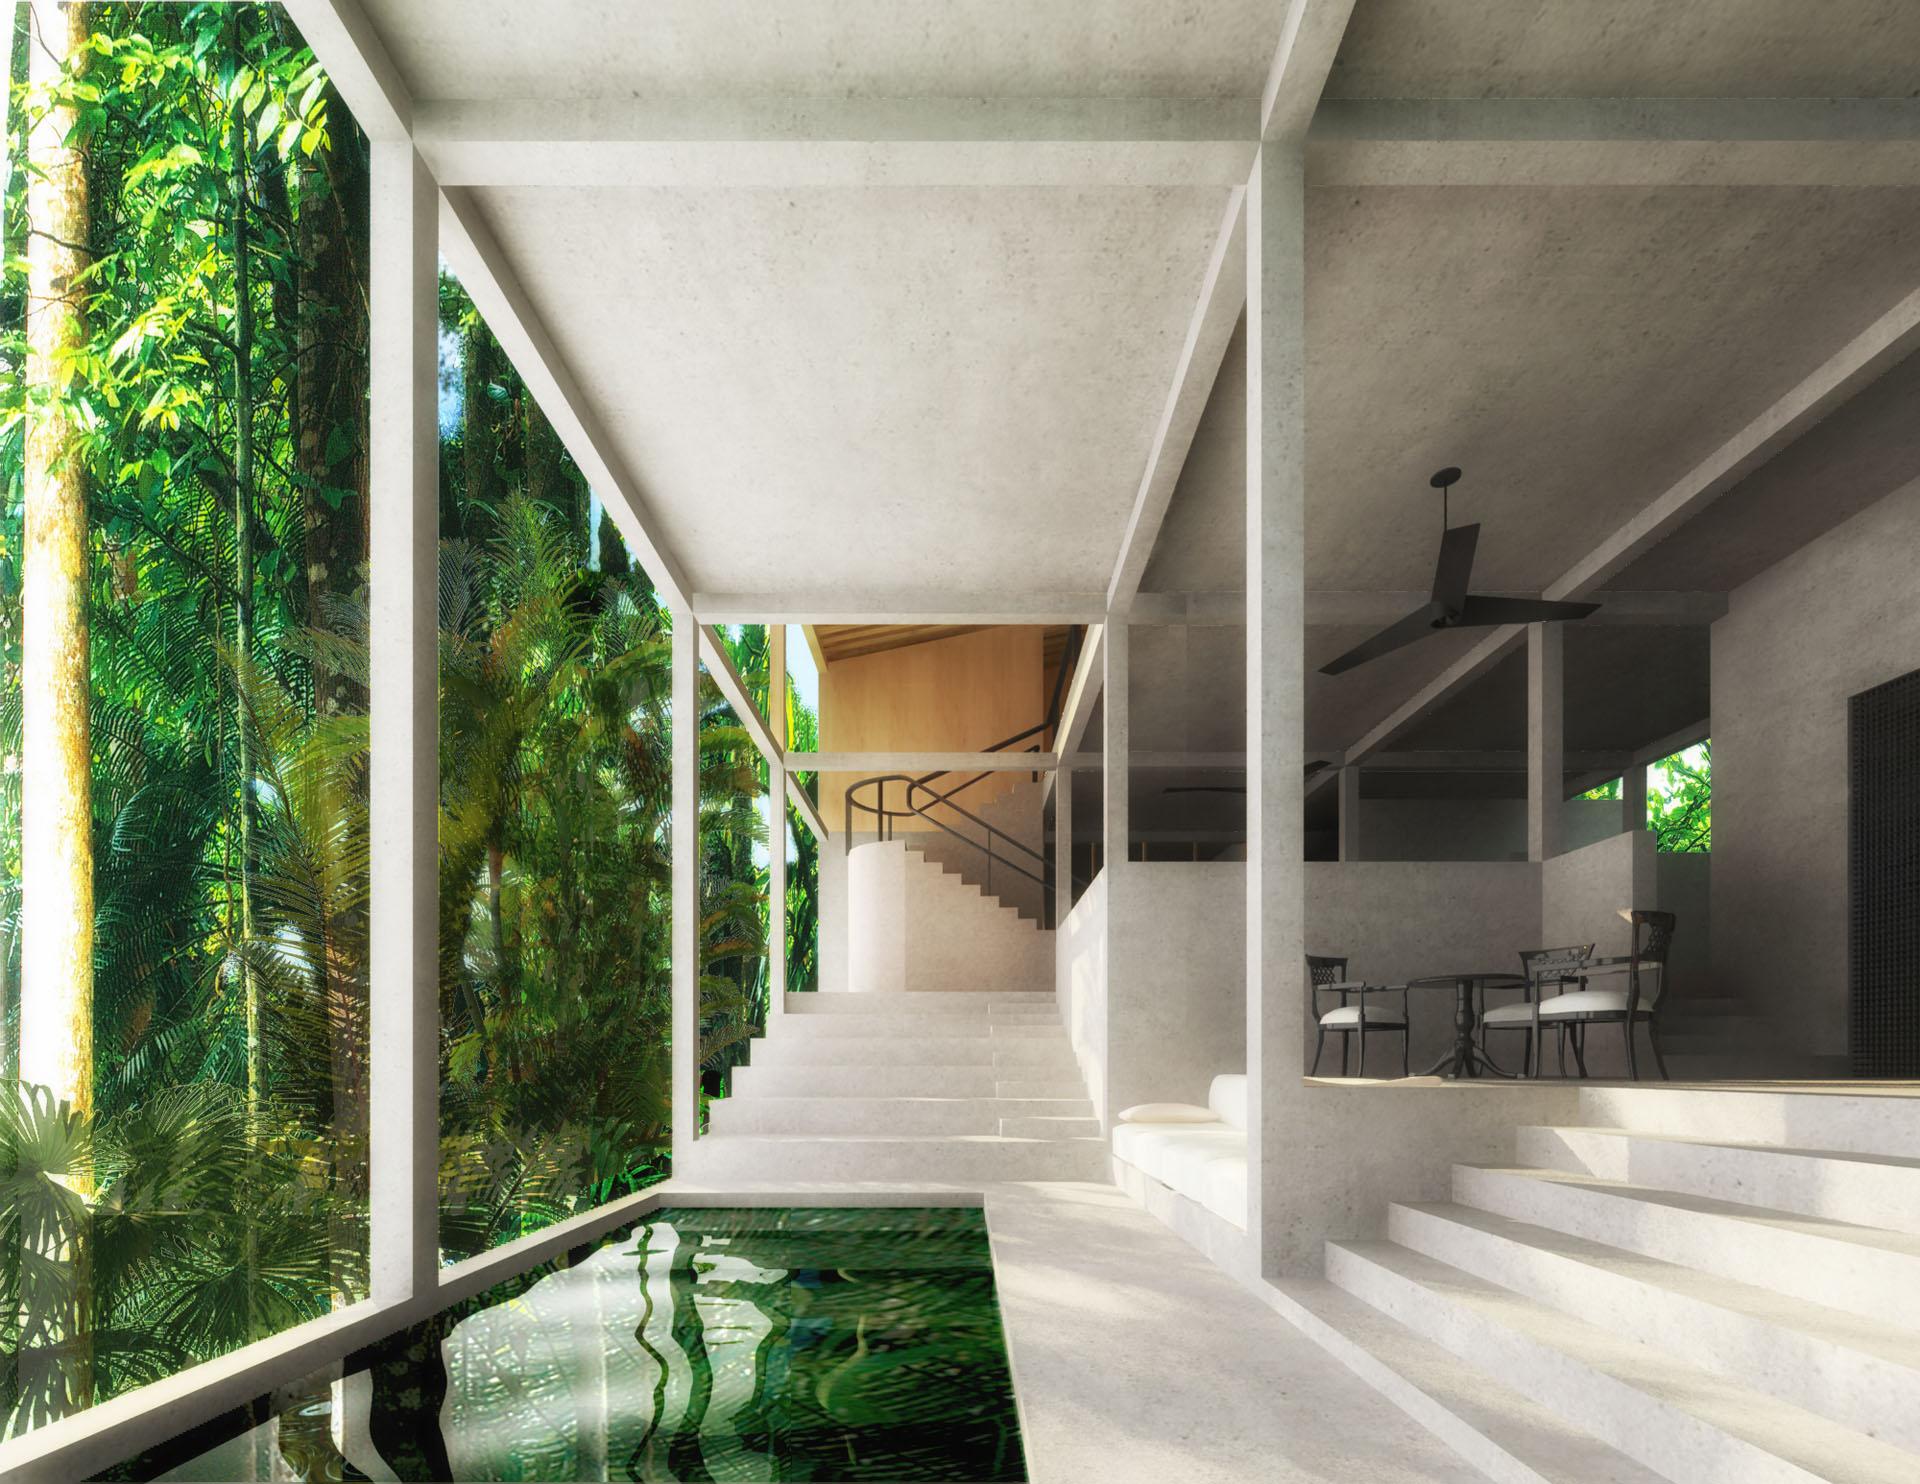 Architectural Design: PRODUCTORA (Carlos Bedoya, Victor Jaime, Wonne Ickx,  Abel Perles)   Collaborators: Pamela Martinez, Lena Kohl, Antonio Espinoza,  ...